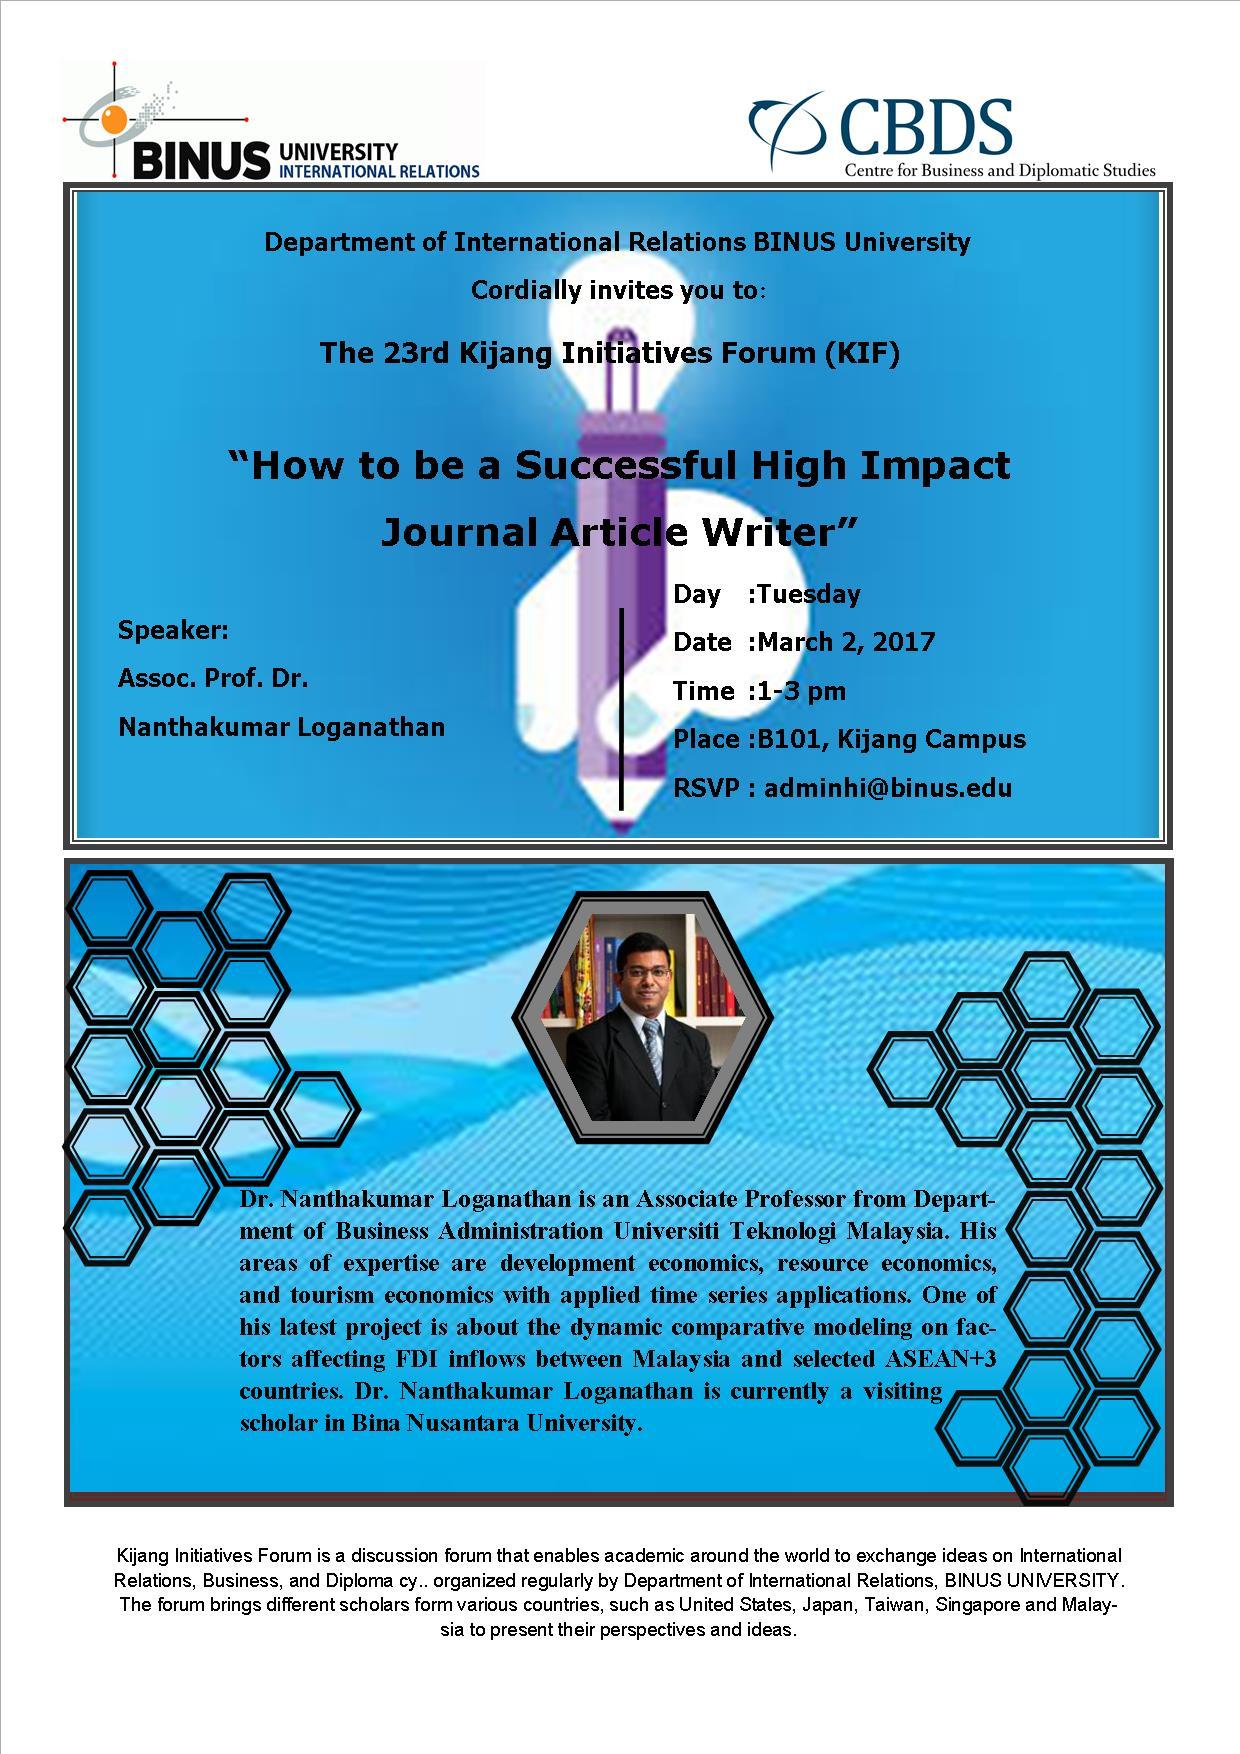 23rd Kijang Initiatives Forum